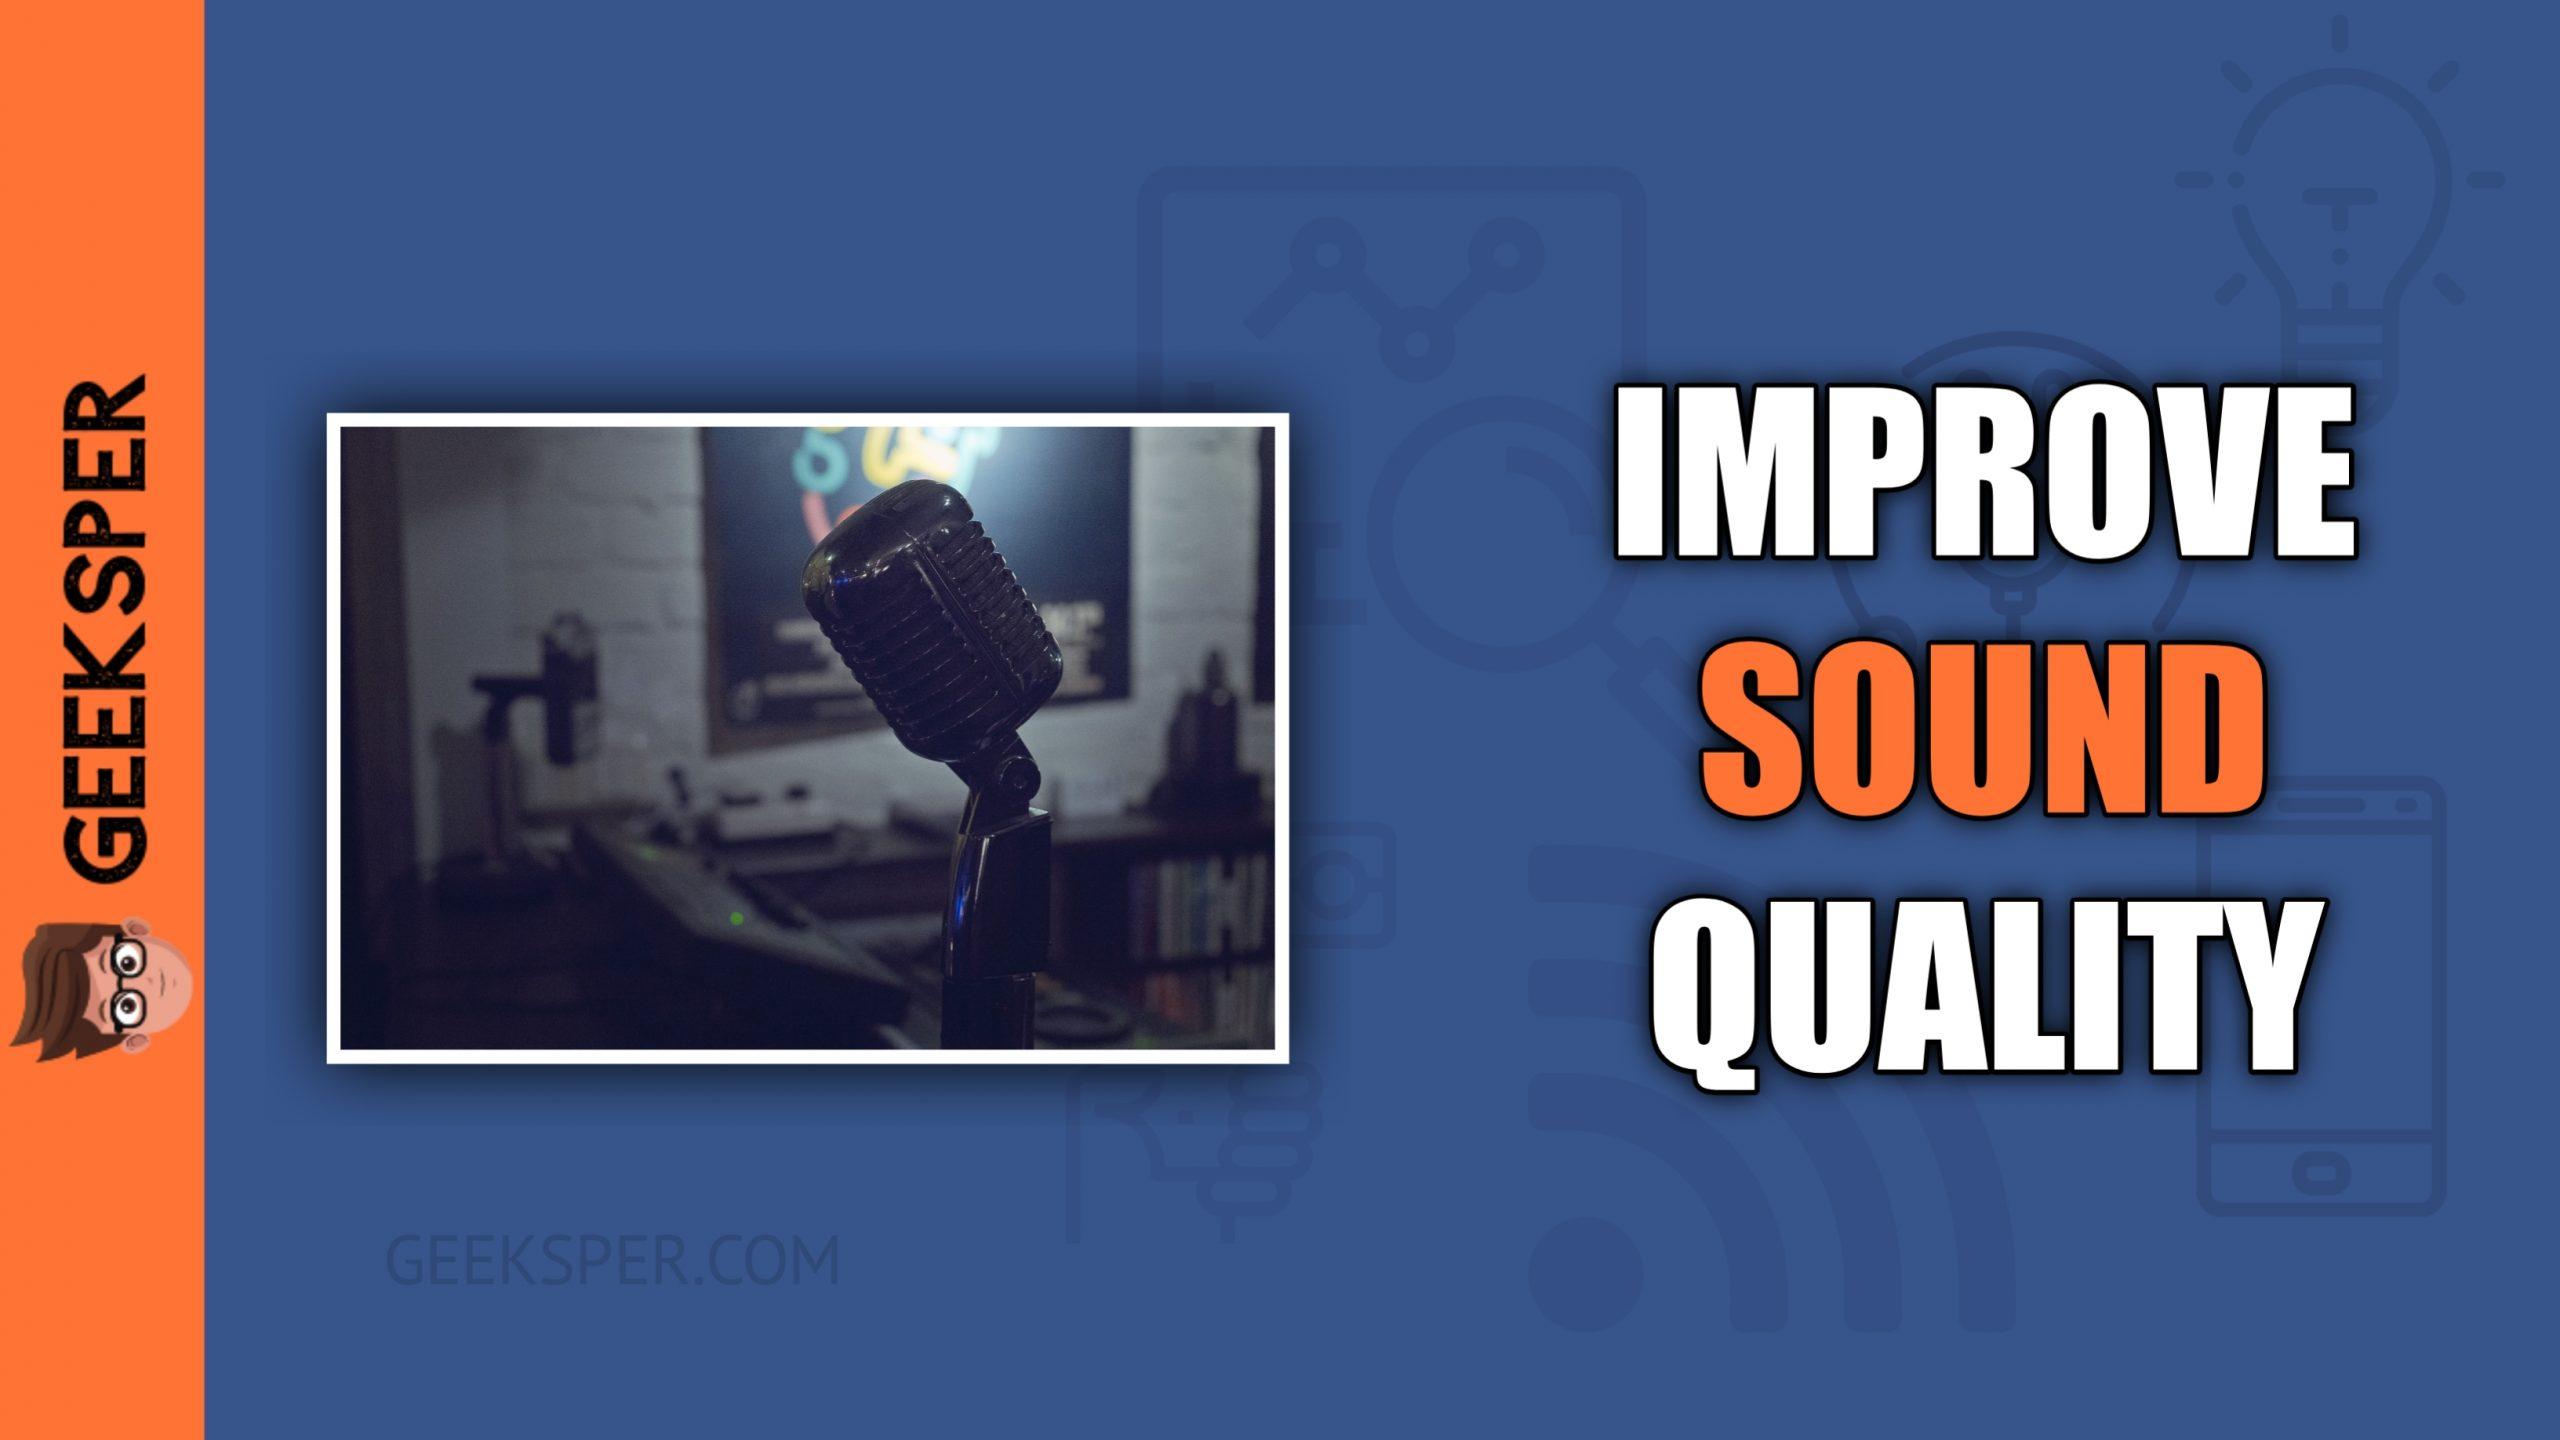 Improve Microphone Sound Quality